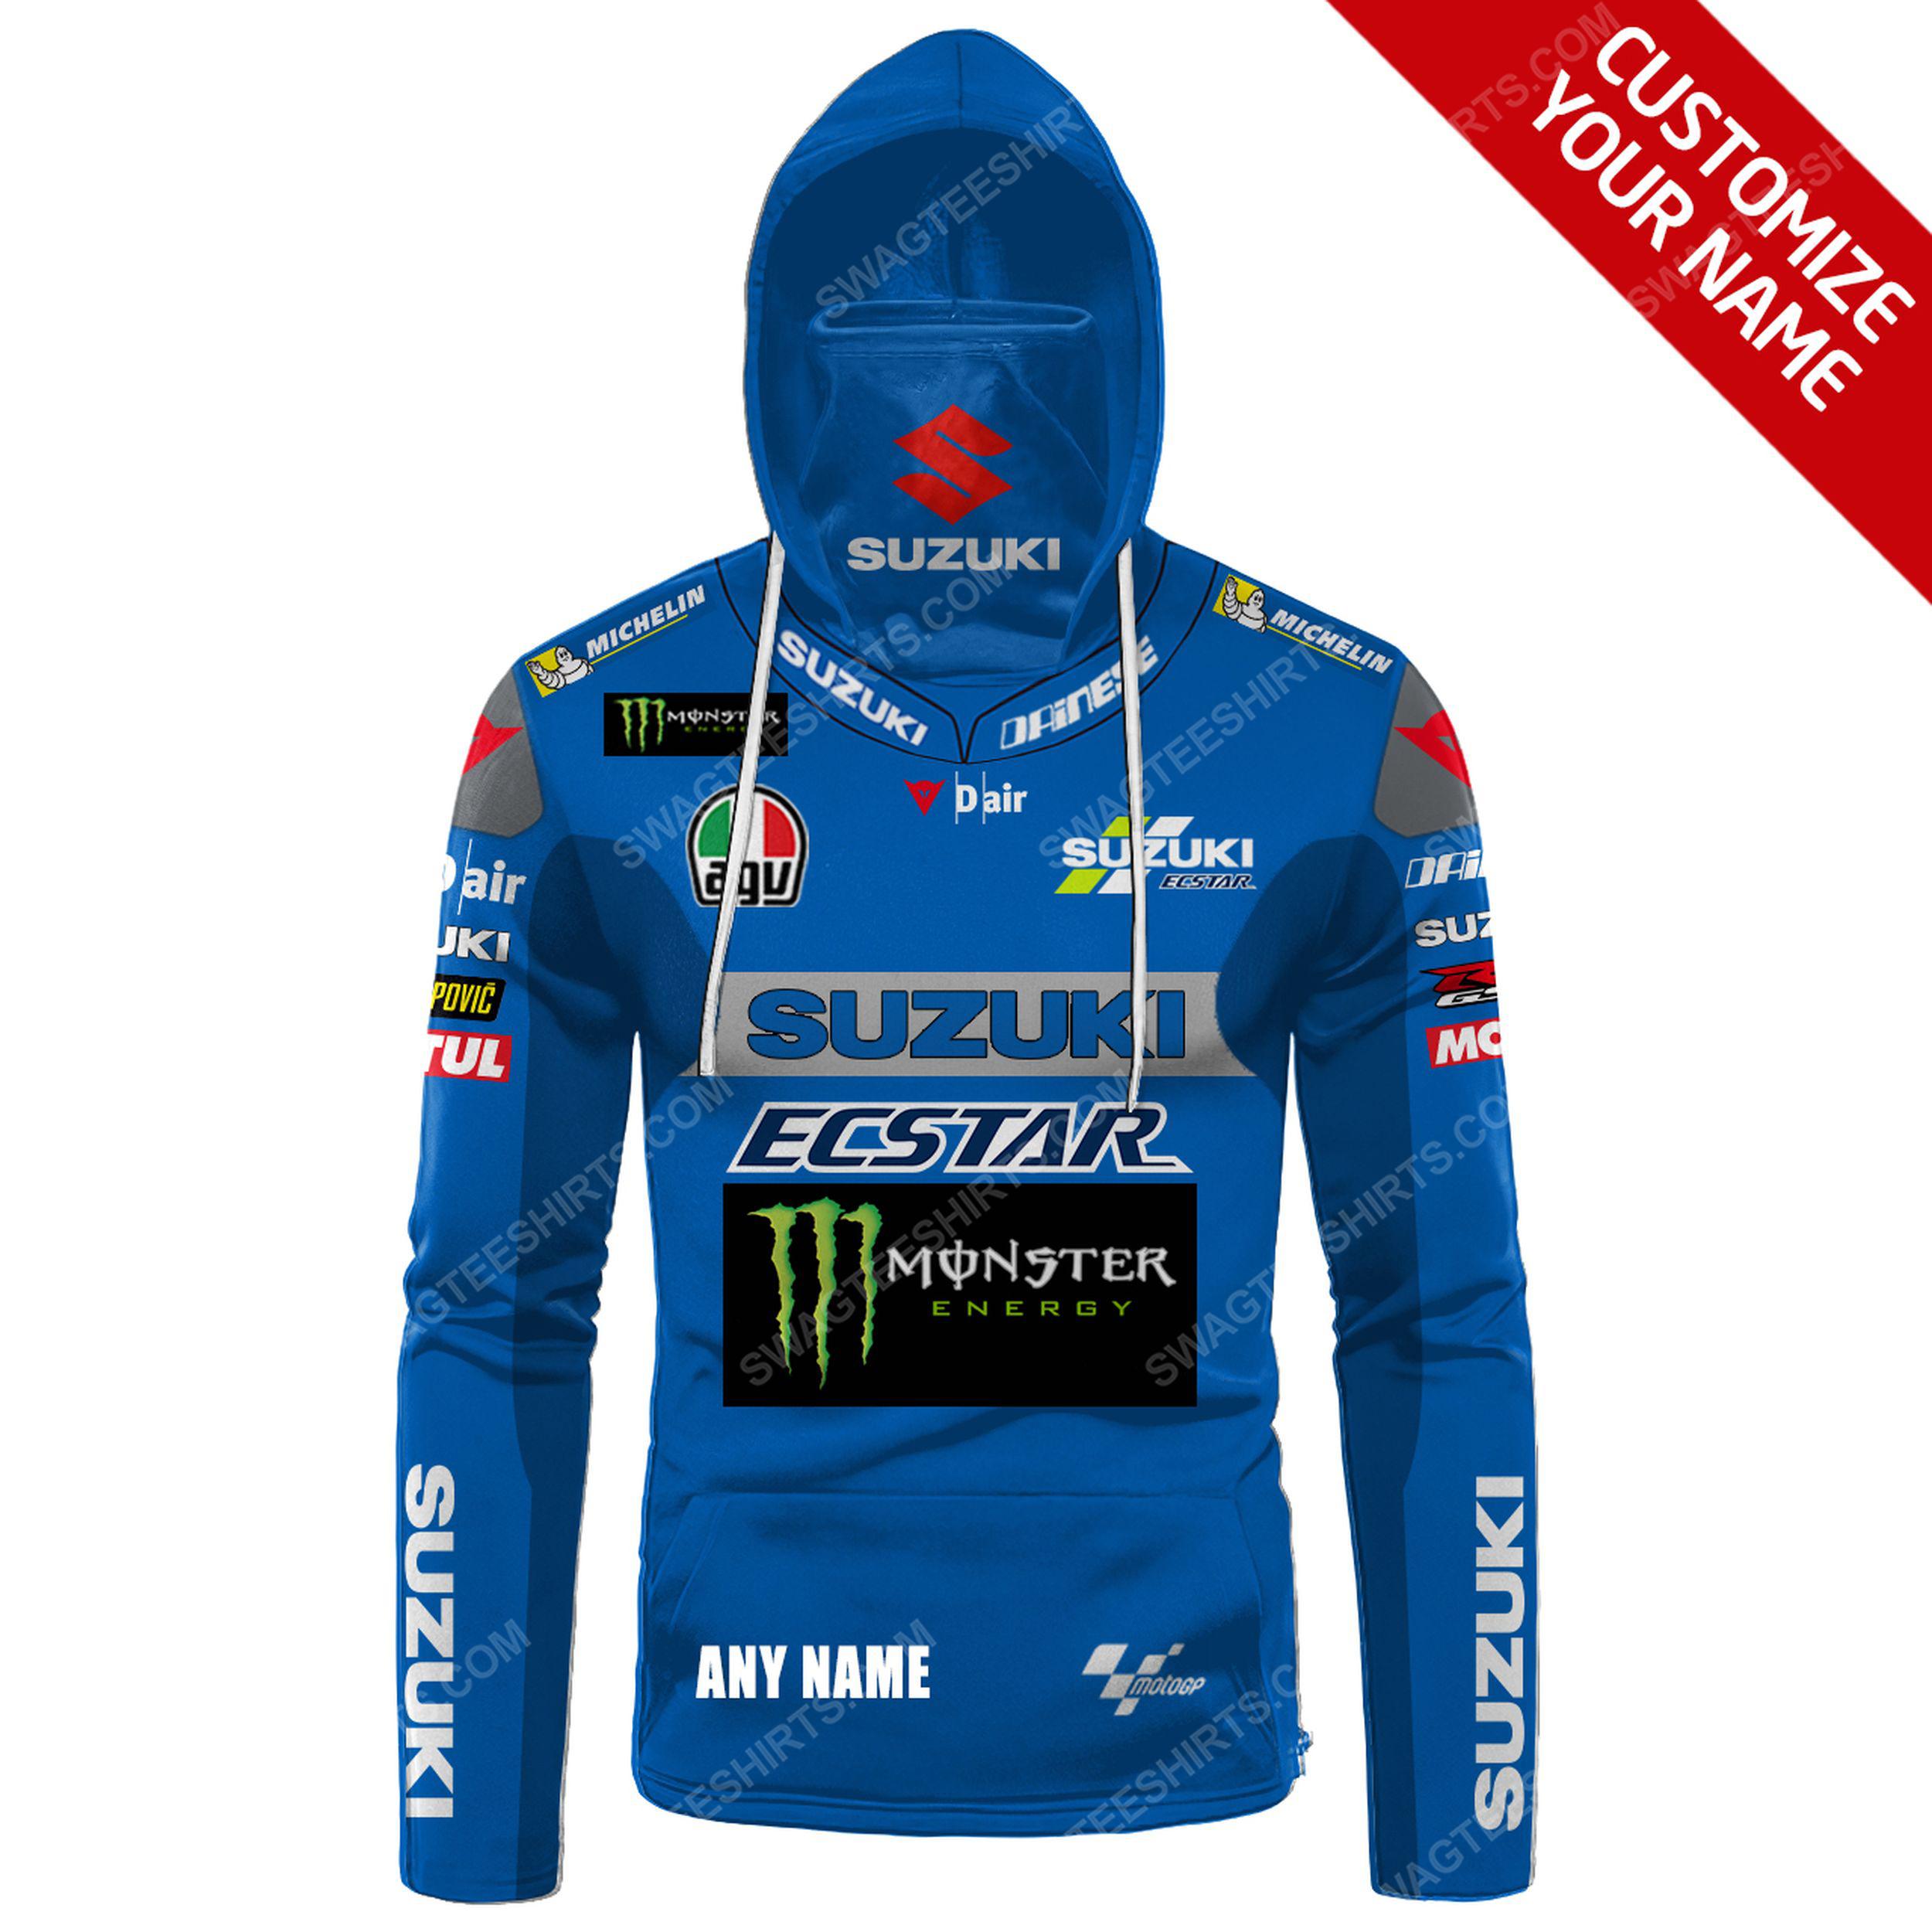 Custom name monster energy suzuki racing full print mask hoodie 2(1)